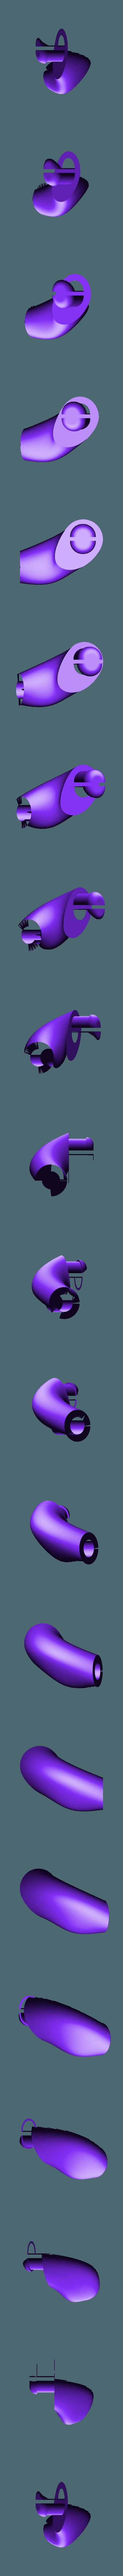 ada-arm.stl Download free STL file Webcam Cover-Up Lego brick with Adabot Mini Fig • 3D printable design, Adafruit